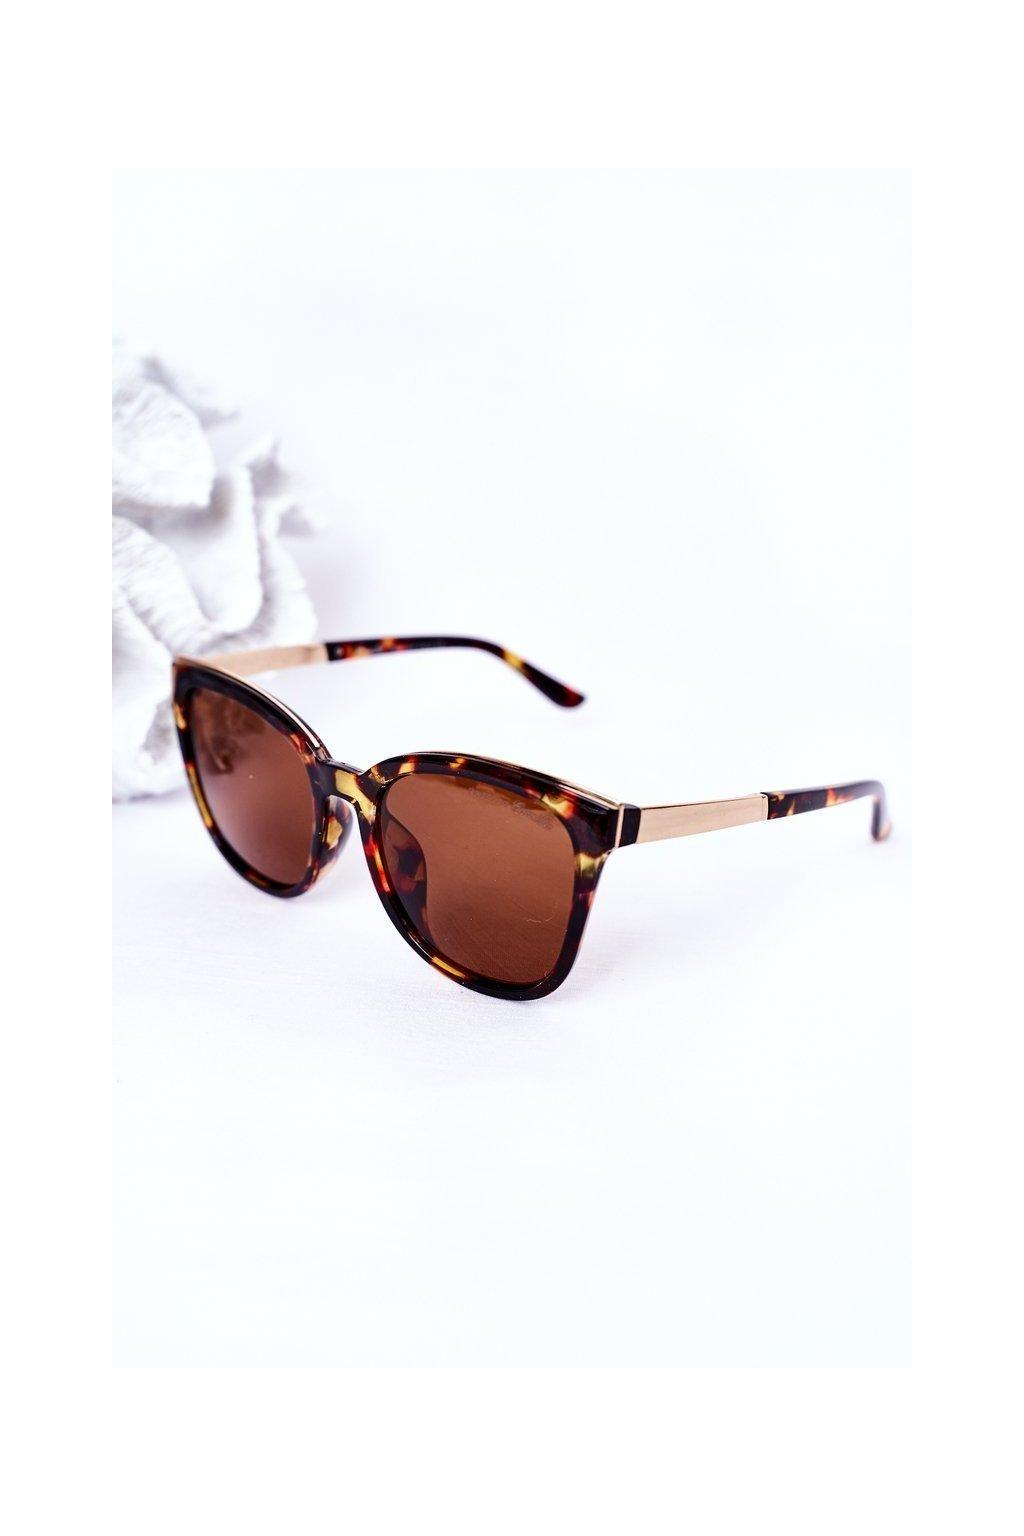 Módne slnečné okuliare hnedé Camilla Eyewear CAMILLA001 BROWN